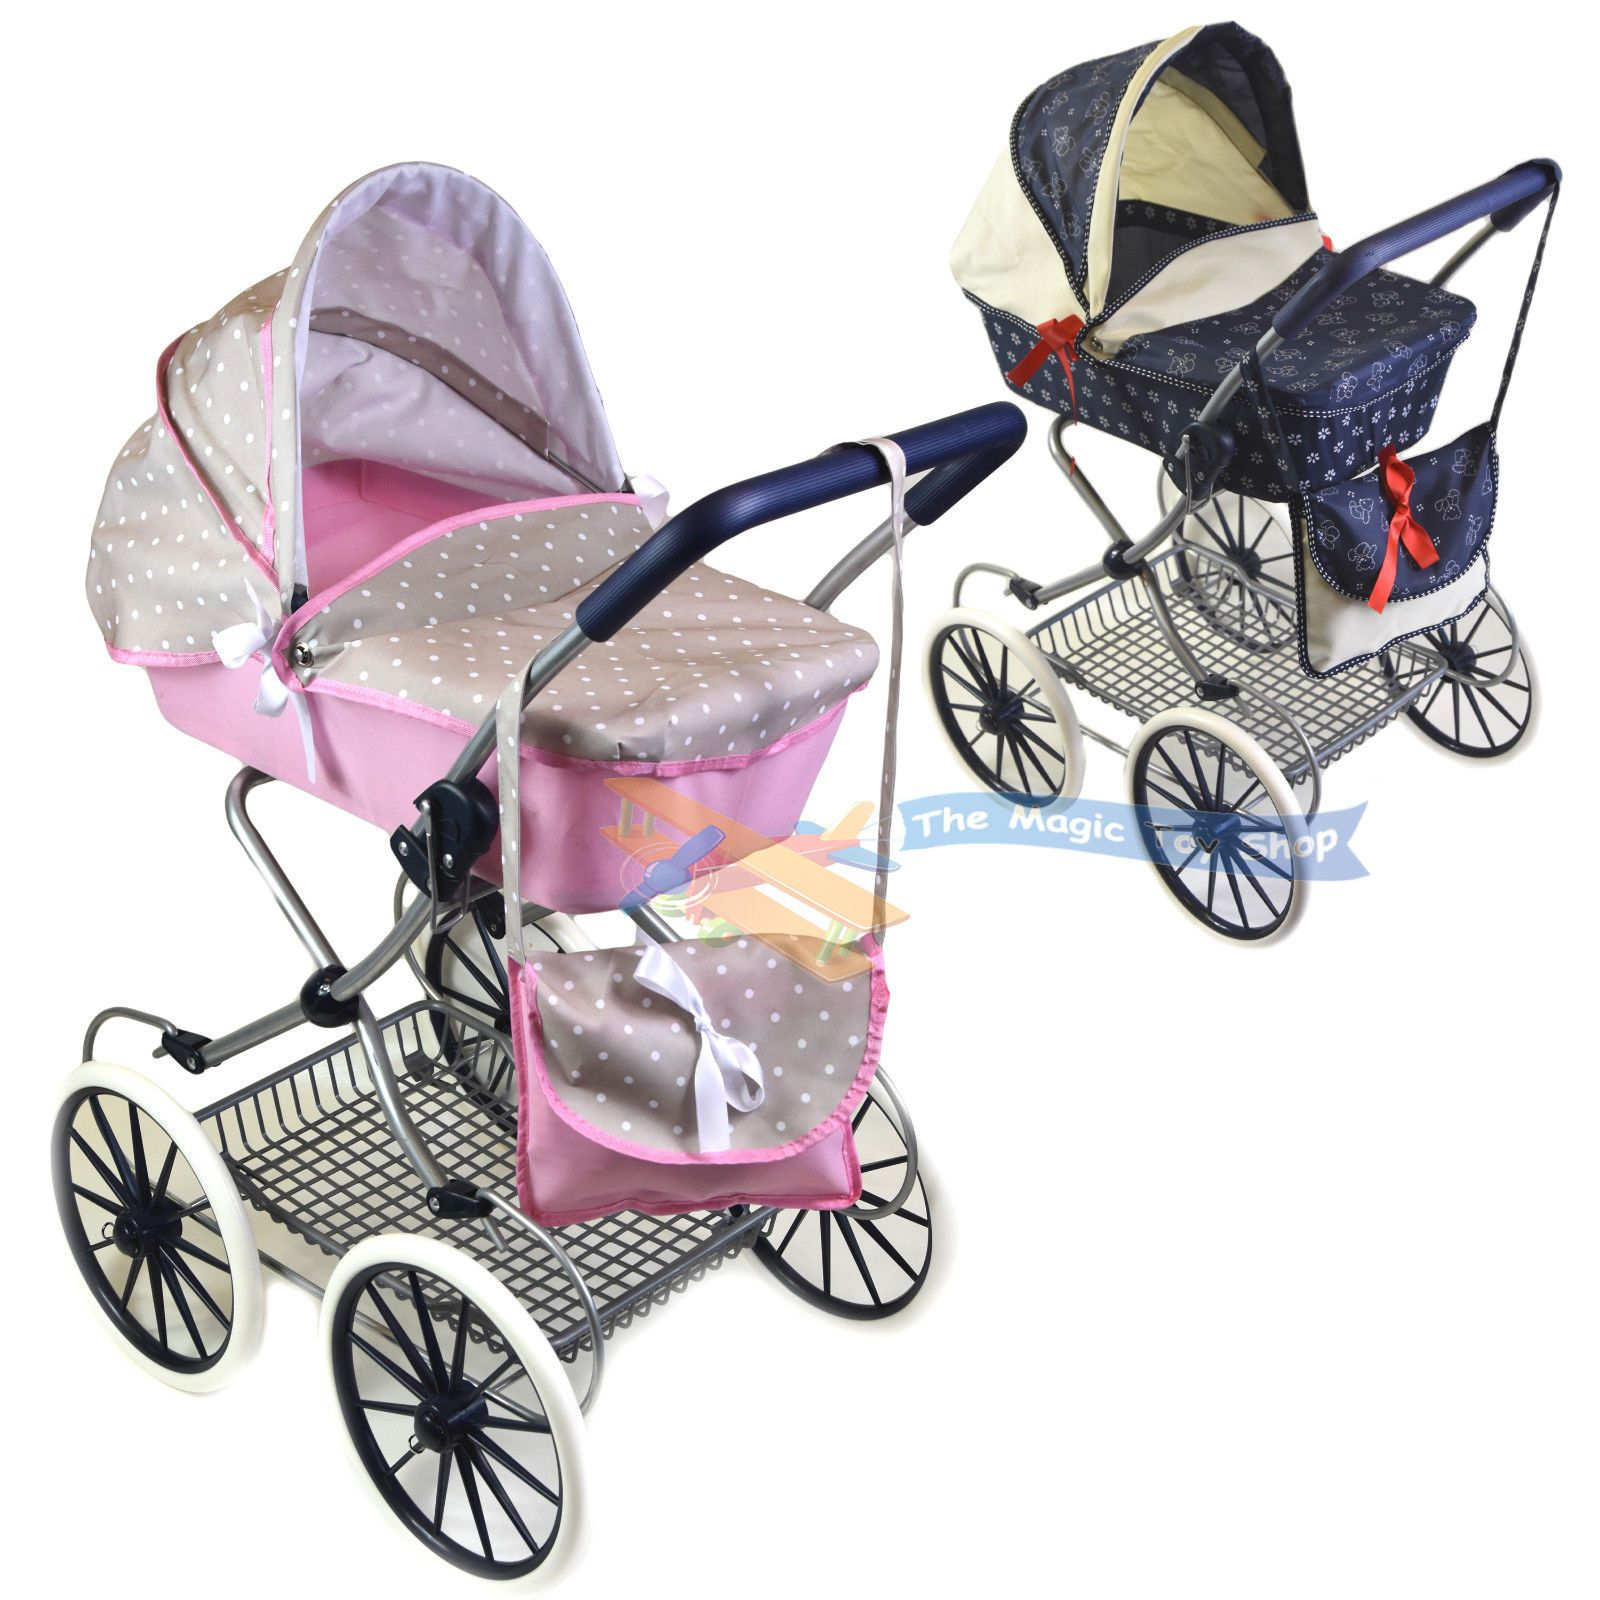 Cambridge style dolls pram stroller with storage basket and carry bag girl bug